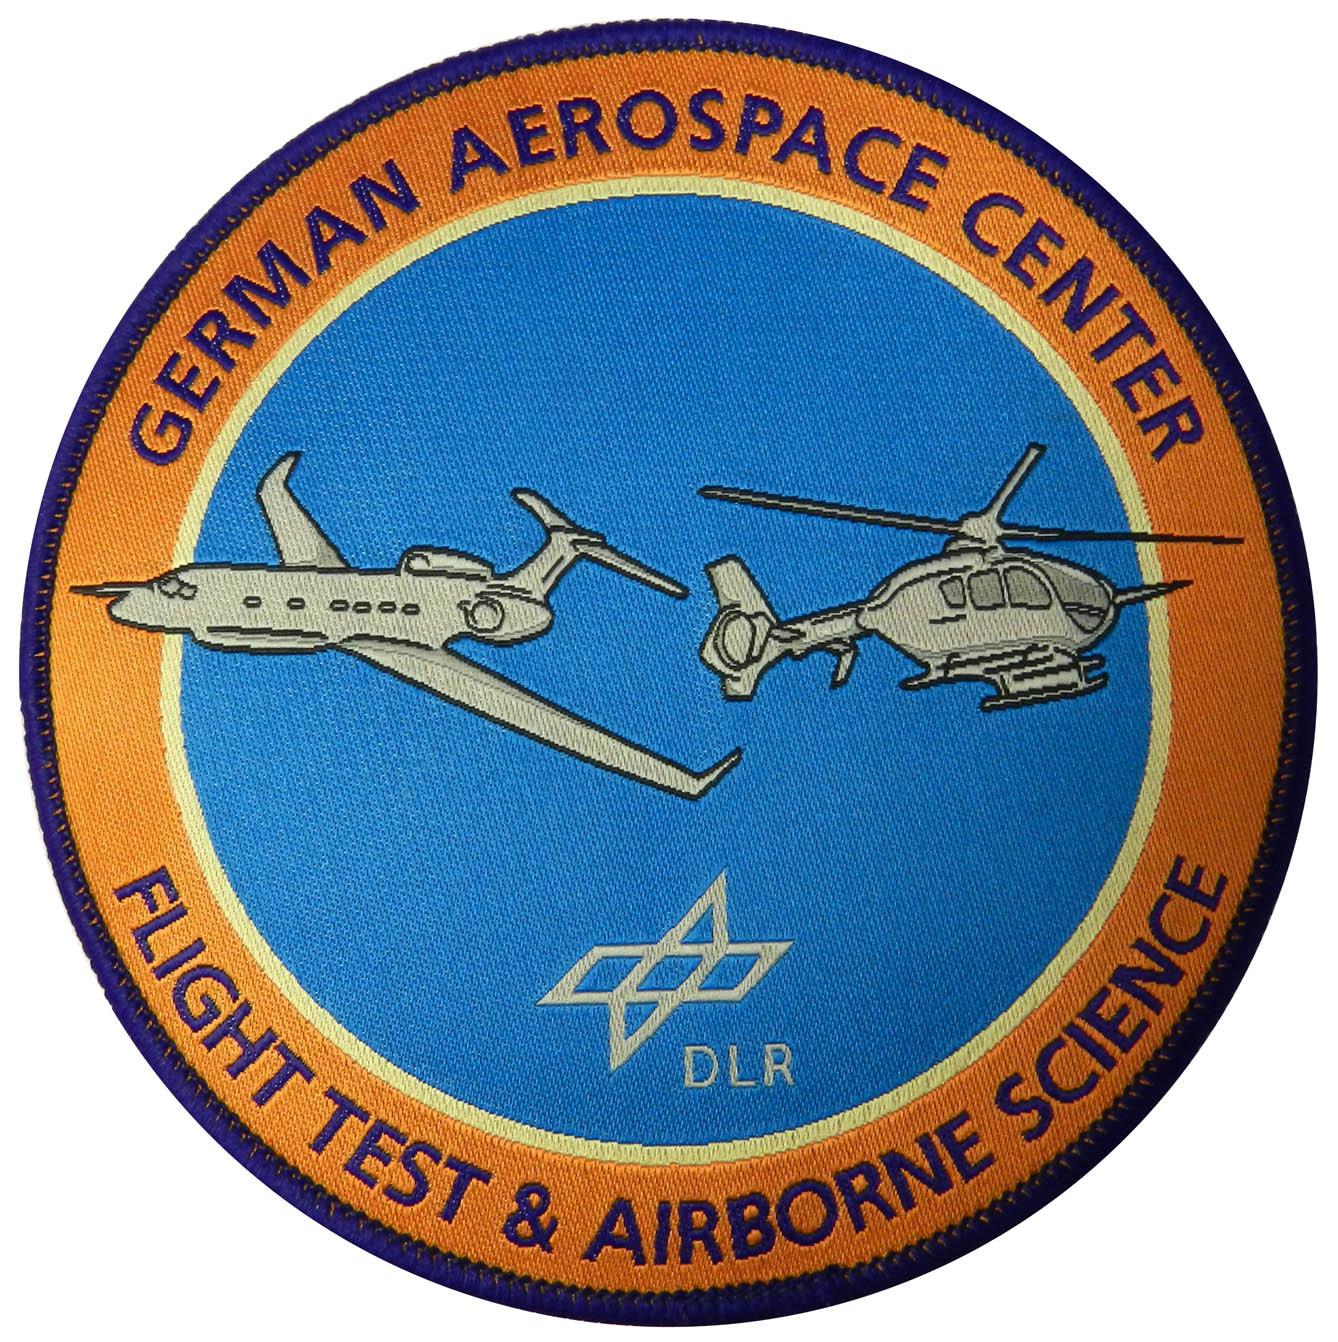 German Aerospace Centre (DLR) Cloth Badges